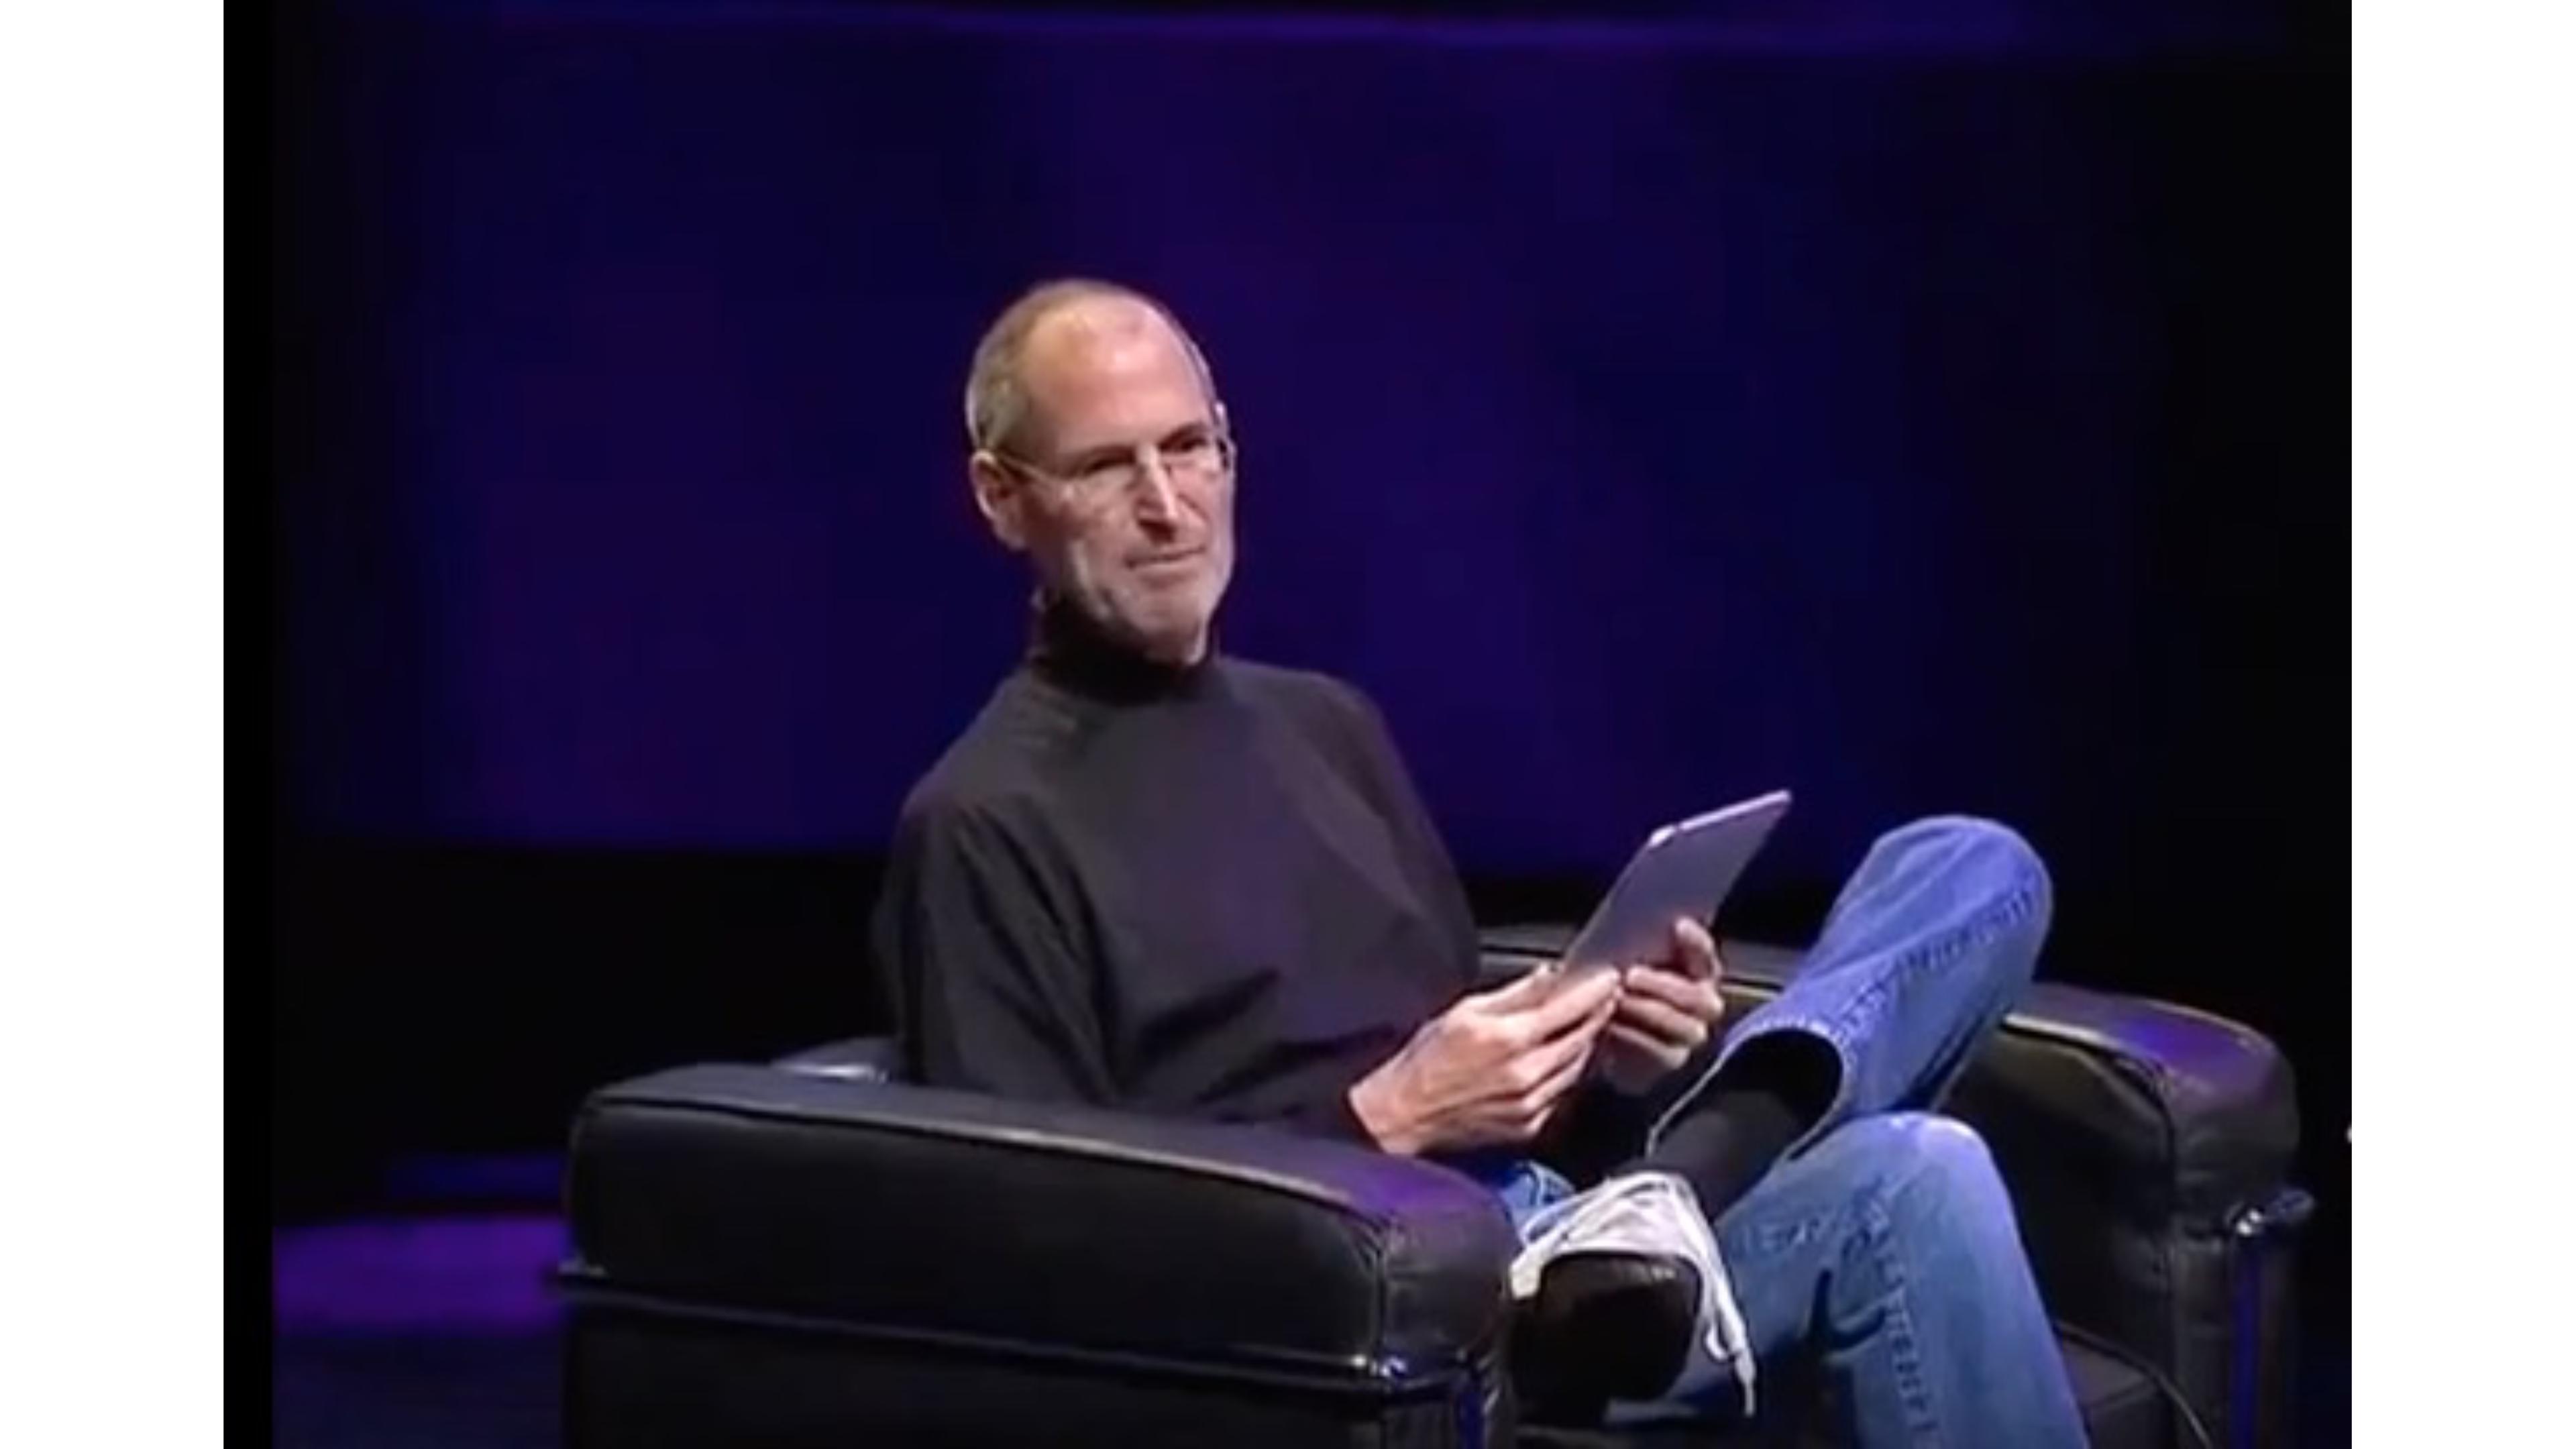 Steve Jobs launches original iPad